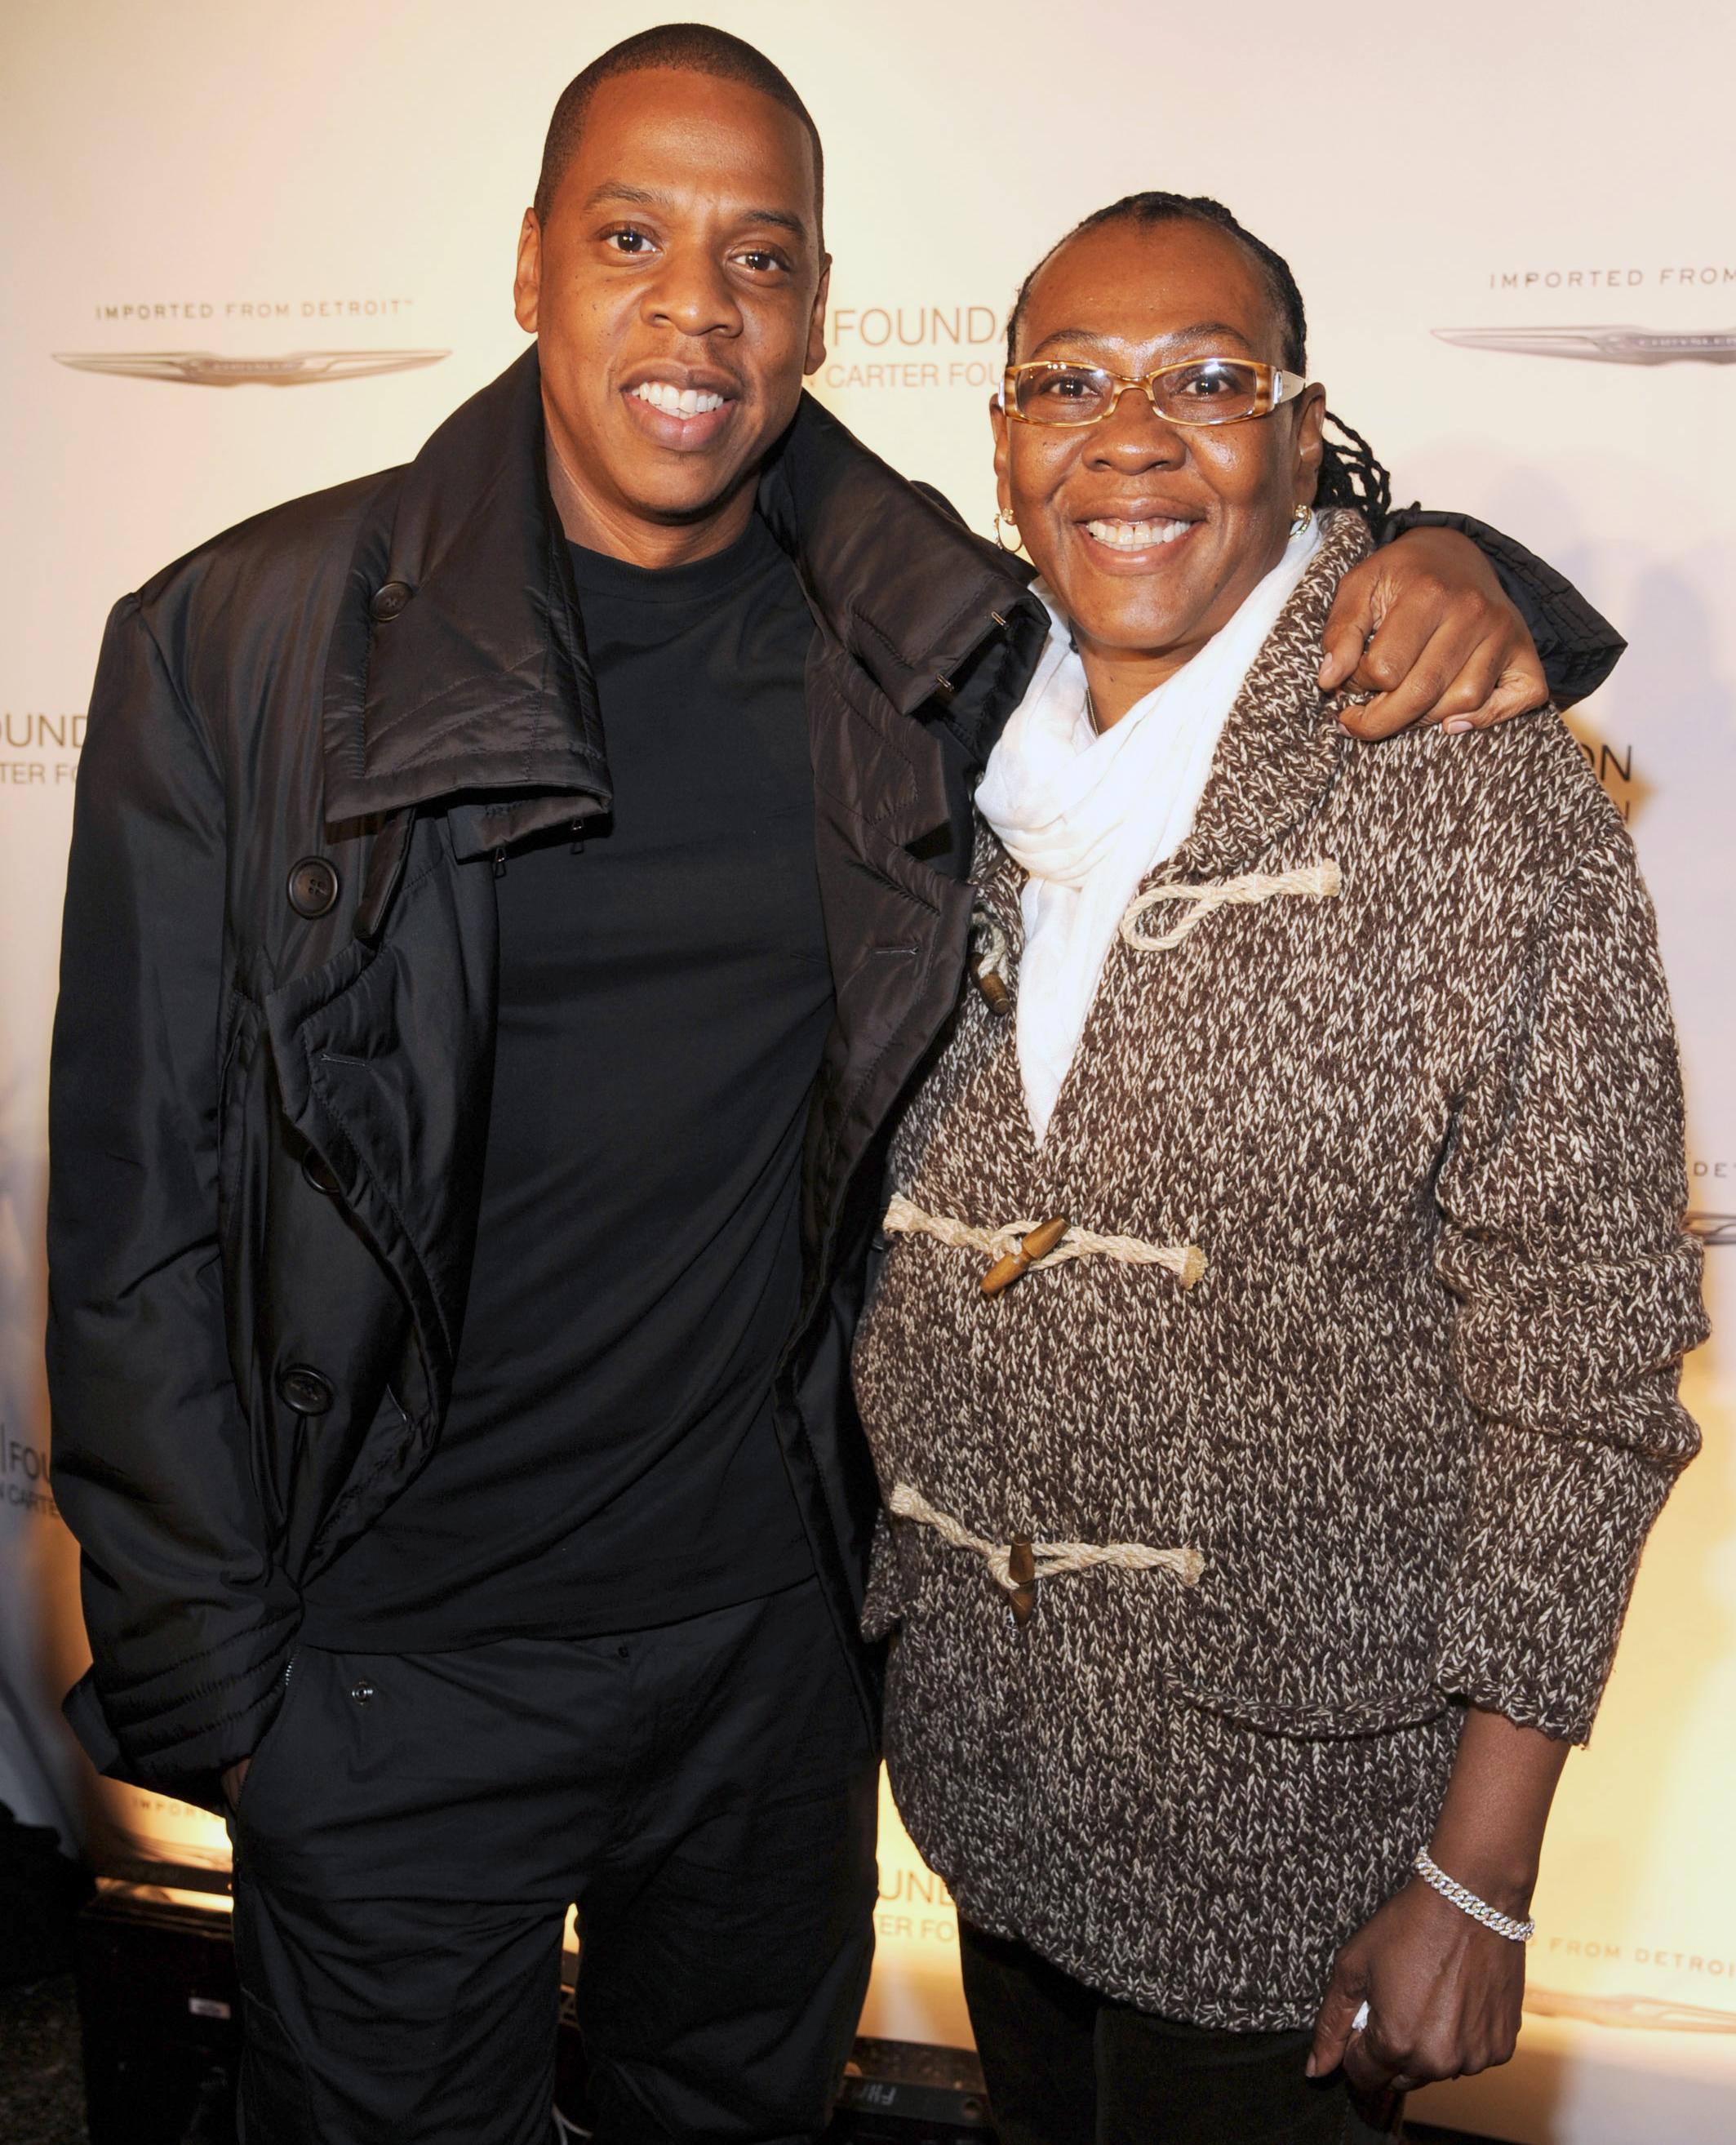 ... Carter Foundation at Pier 54 on September 29, 2011 in New York City